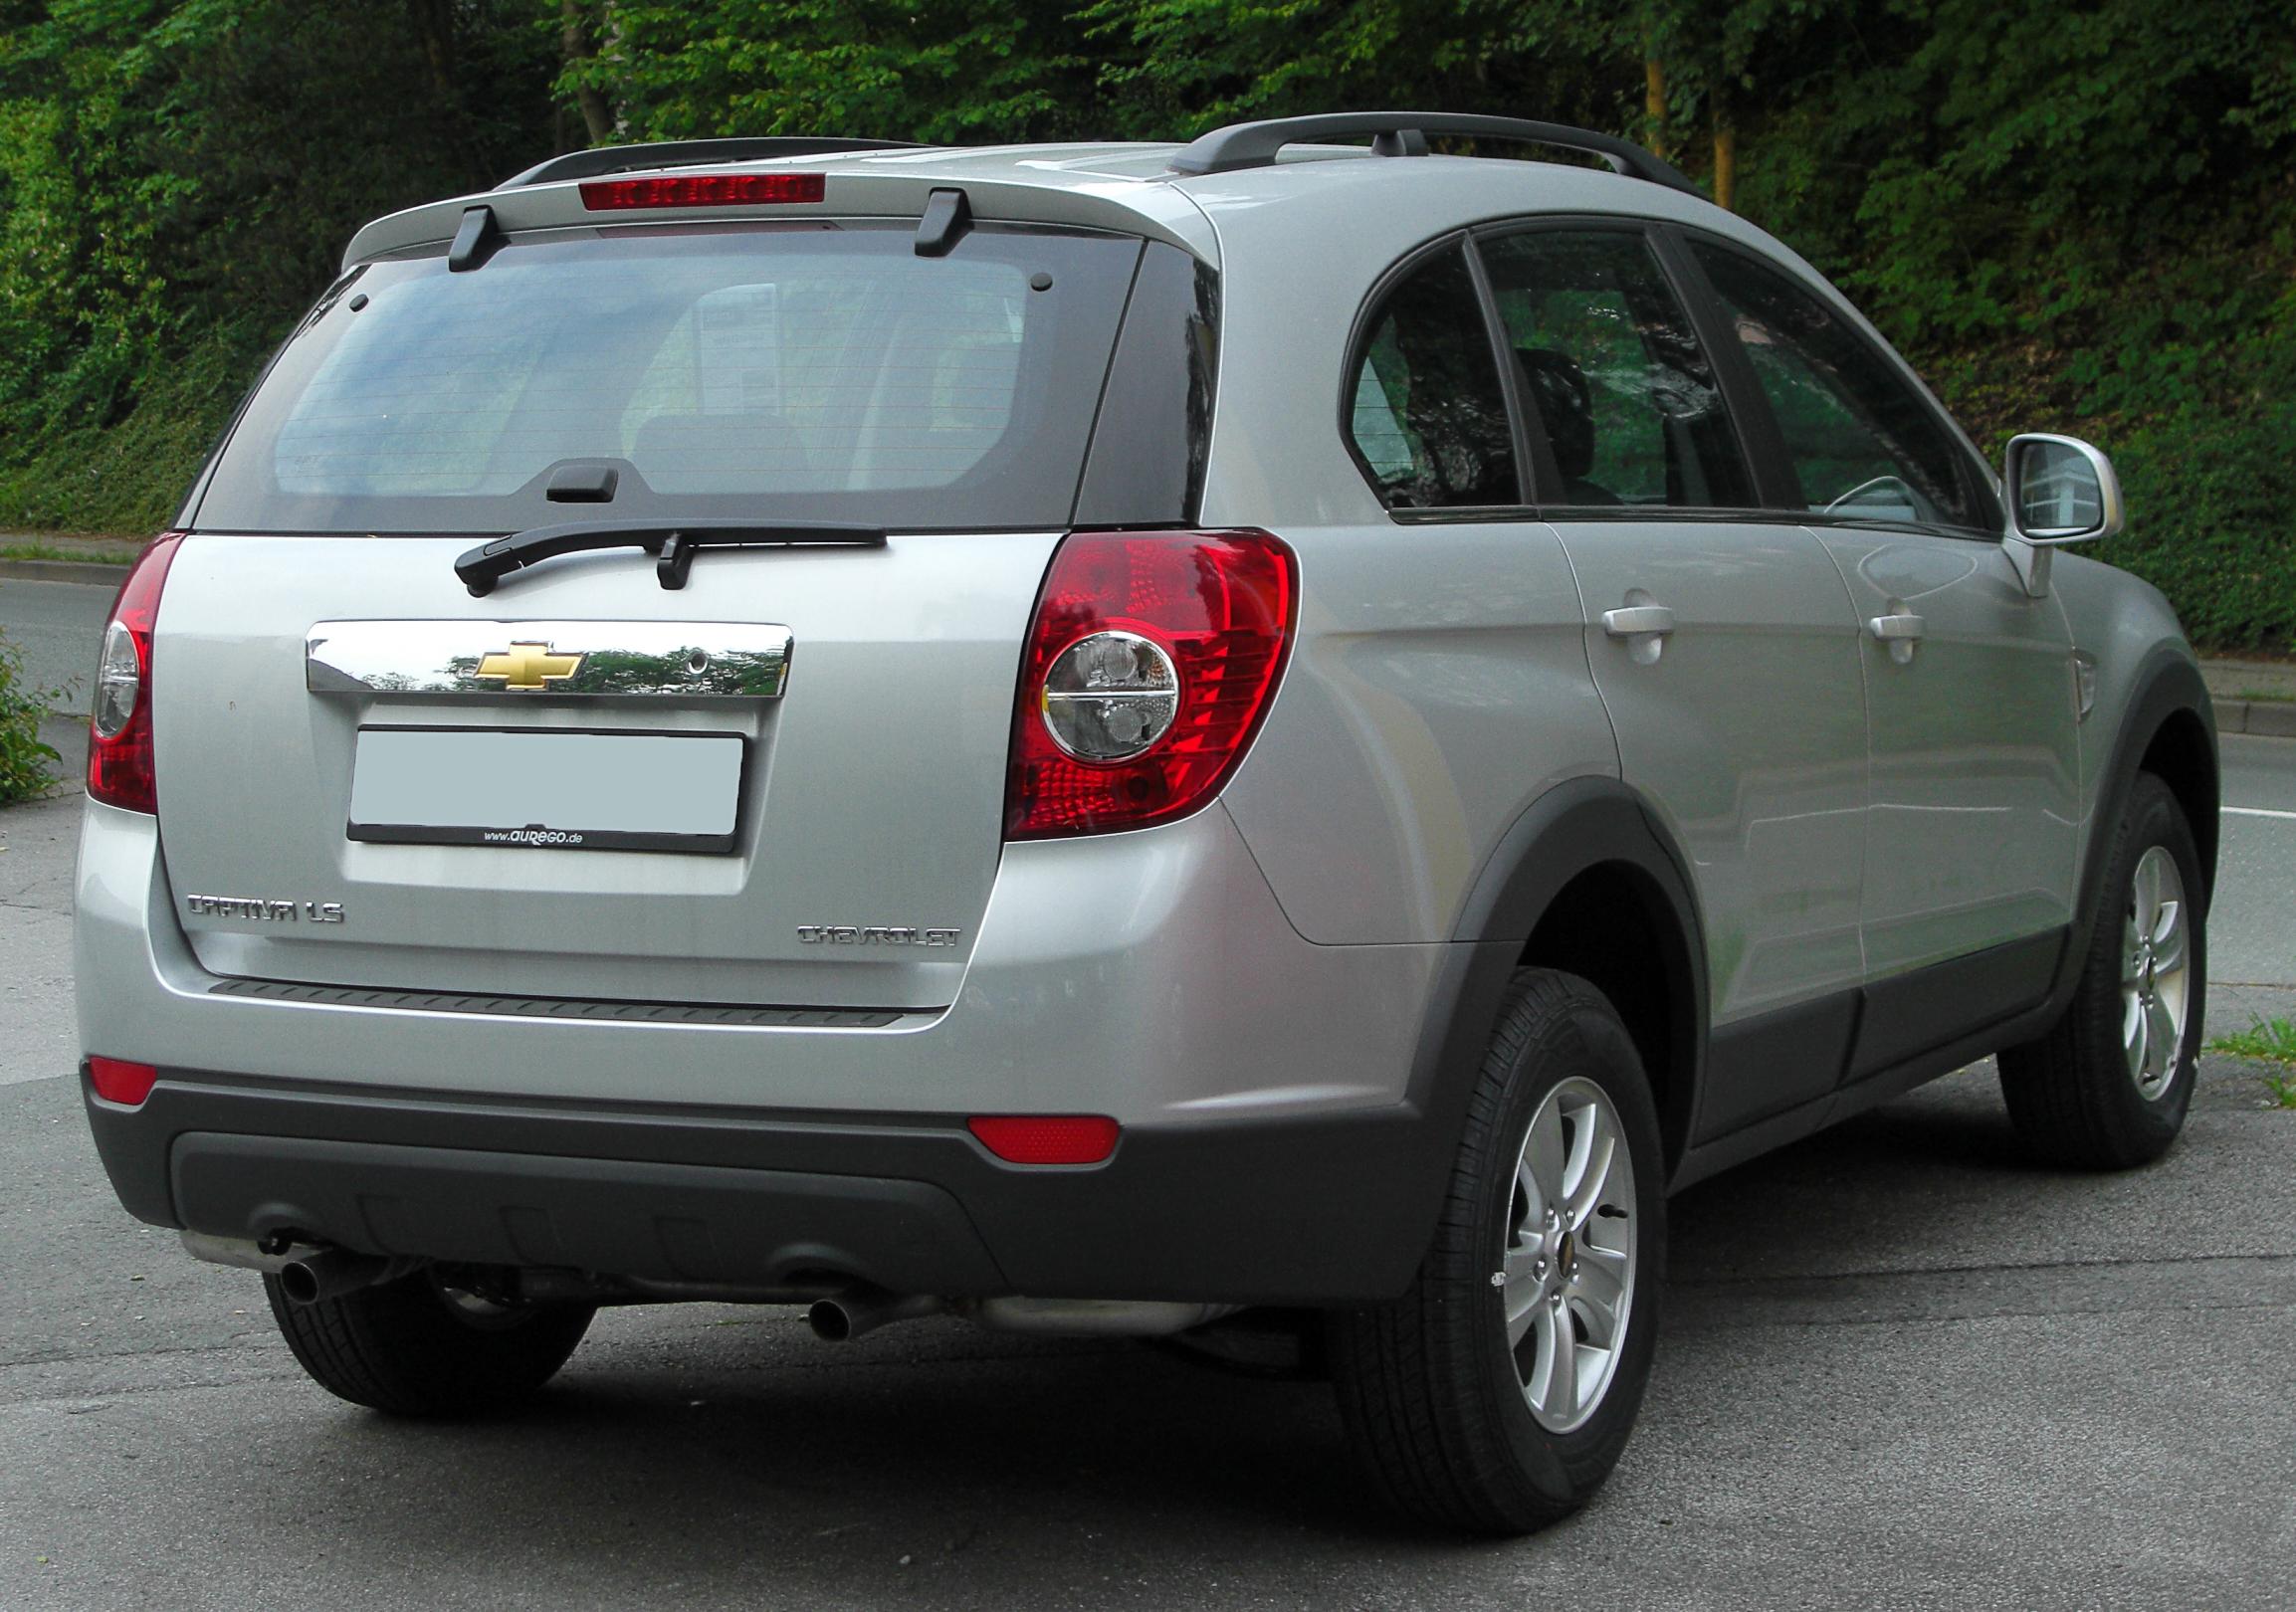 Chevrolet Captiva I 2006 - 2011 SUV 5 door #2